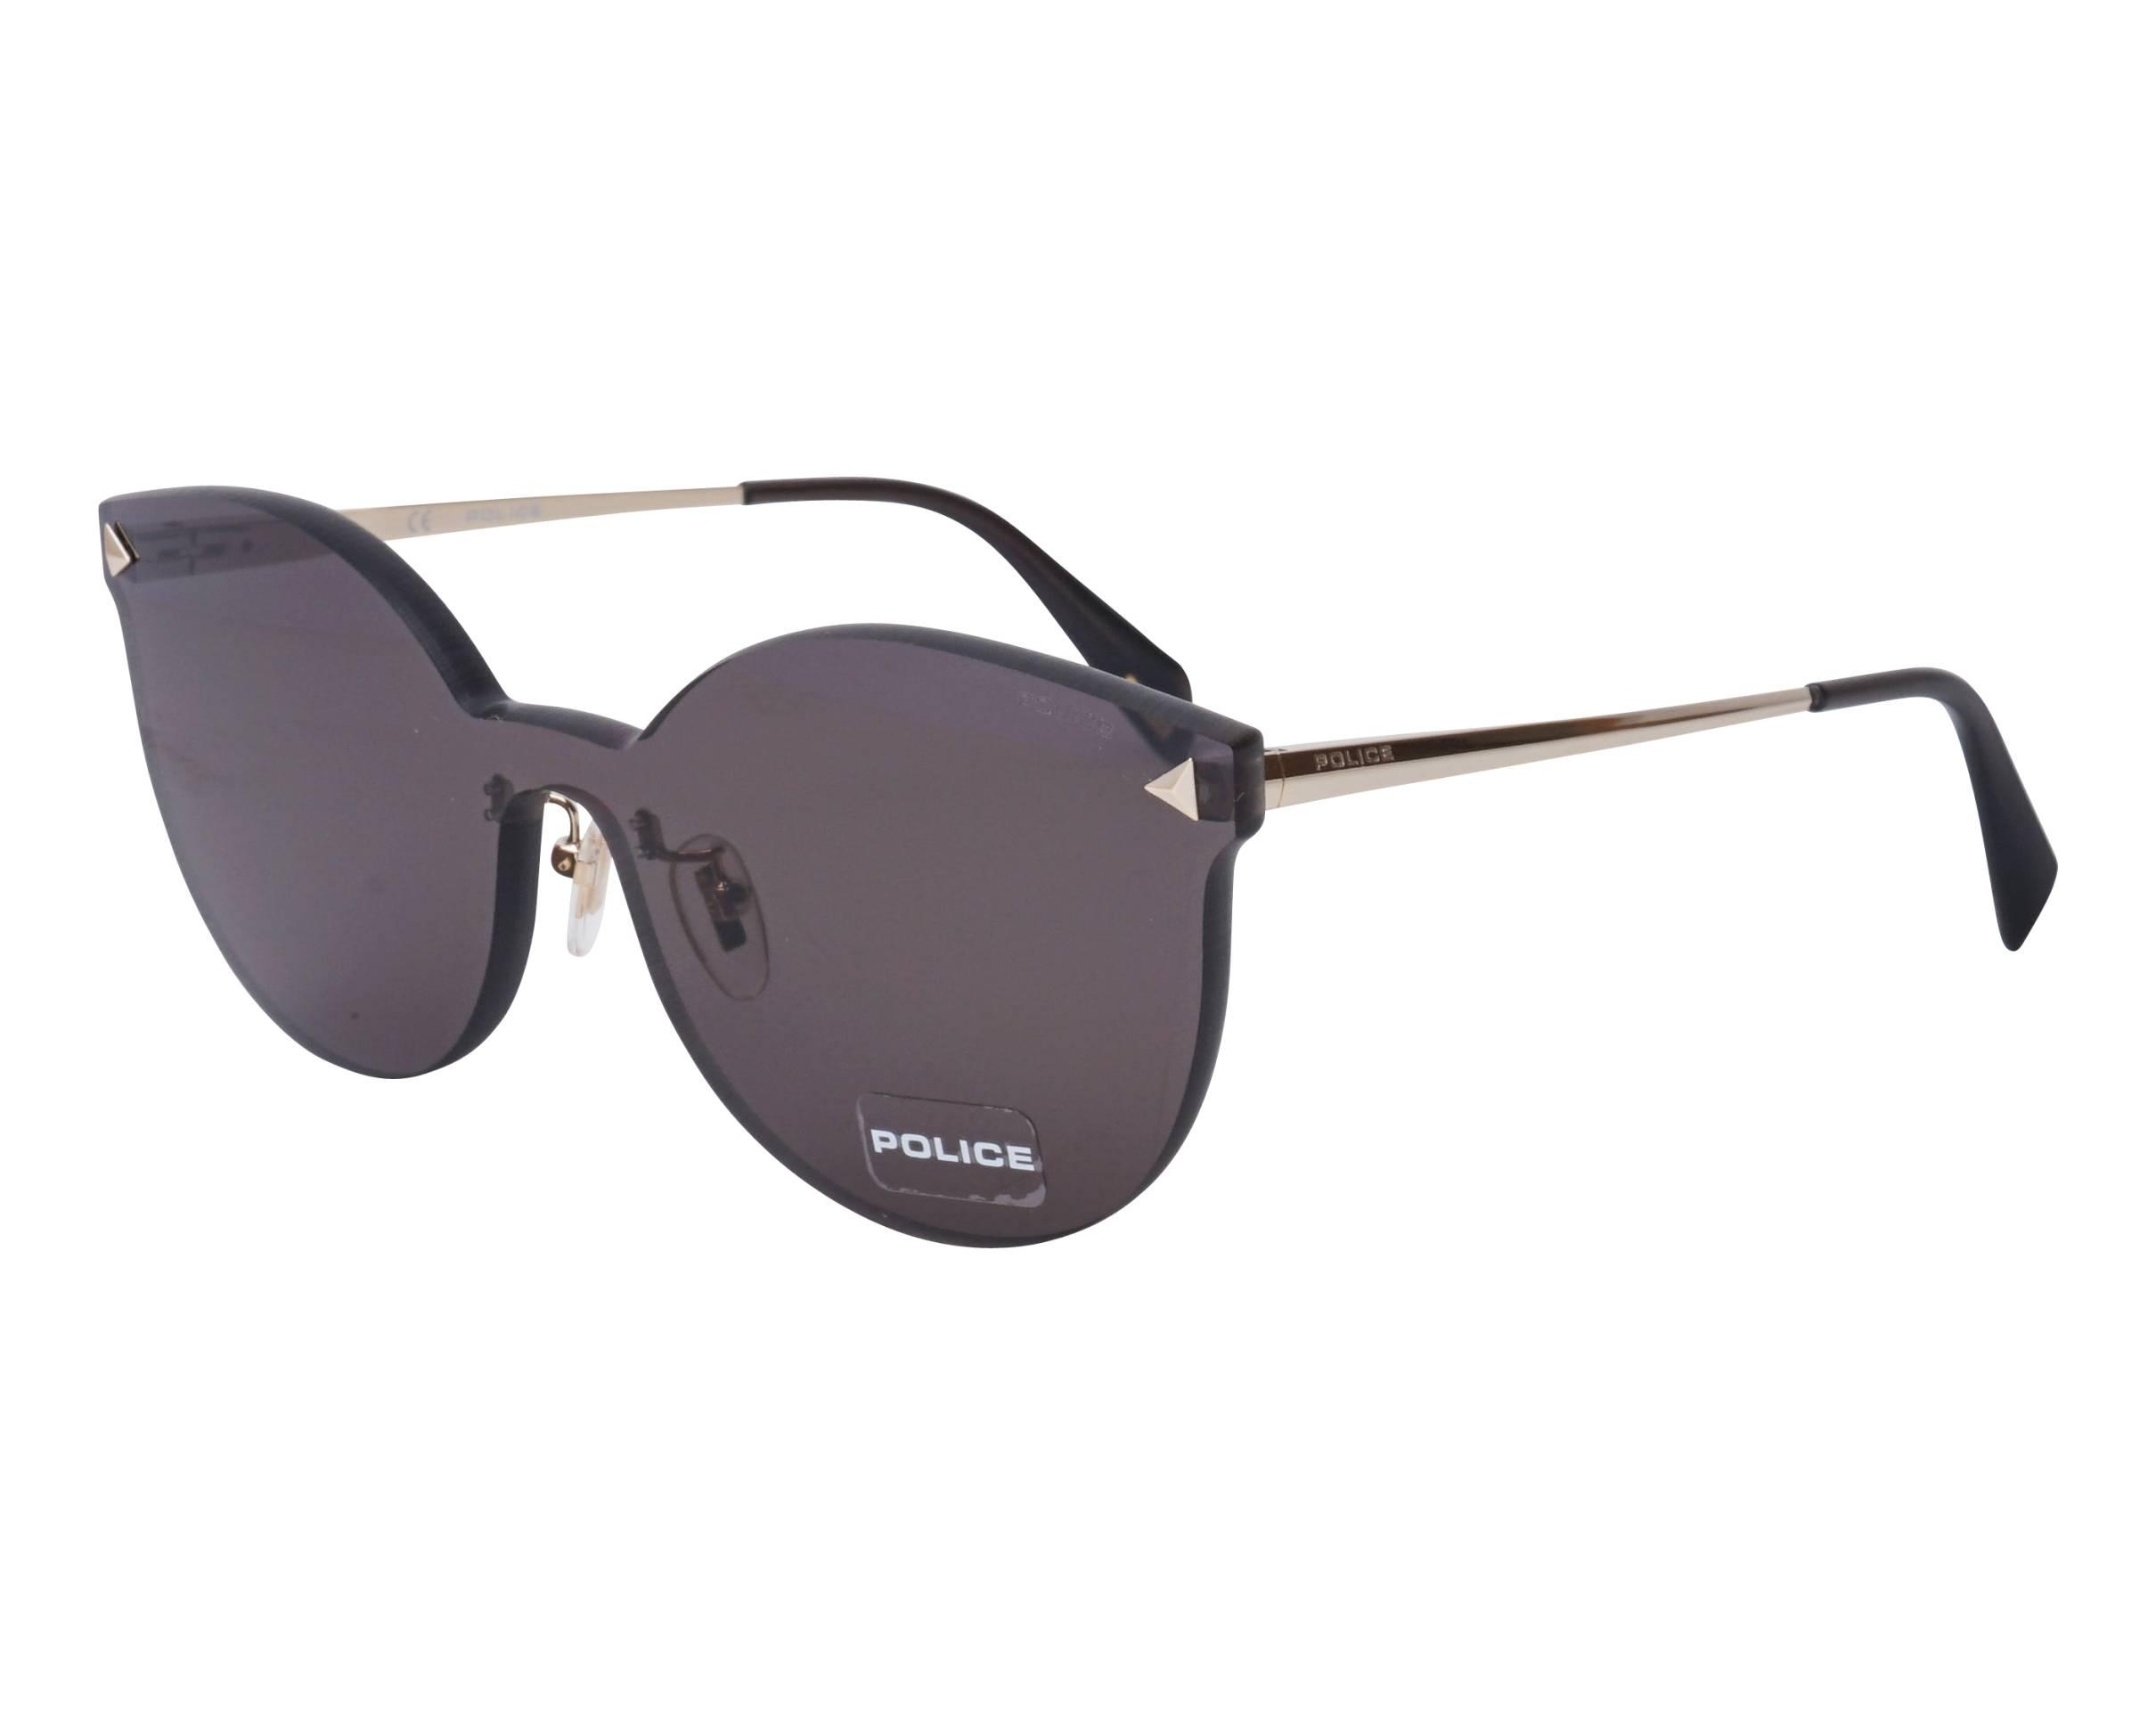 a08ece2f7a Gafas de sol Police SPL-935 0300 60-15 Oro vista de perfil